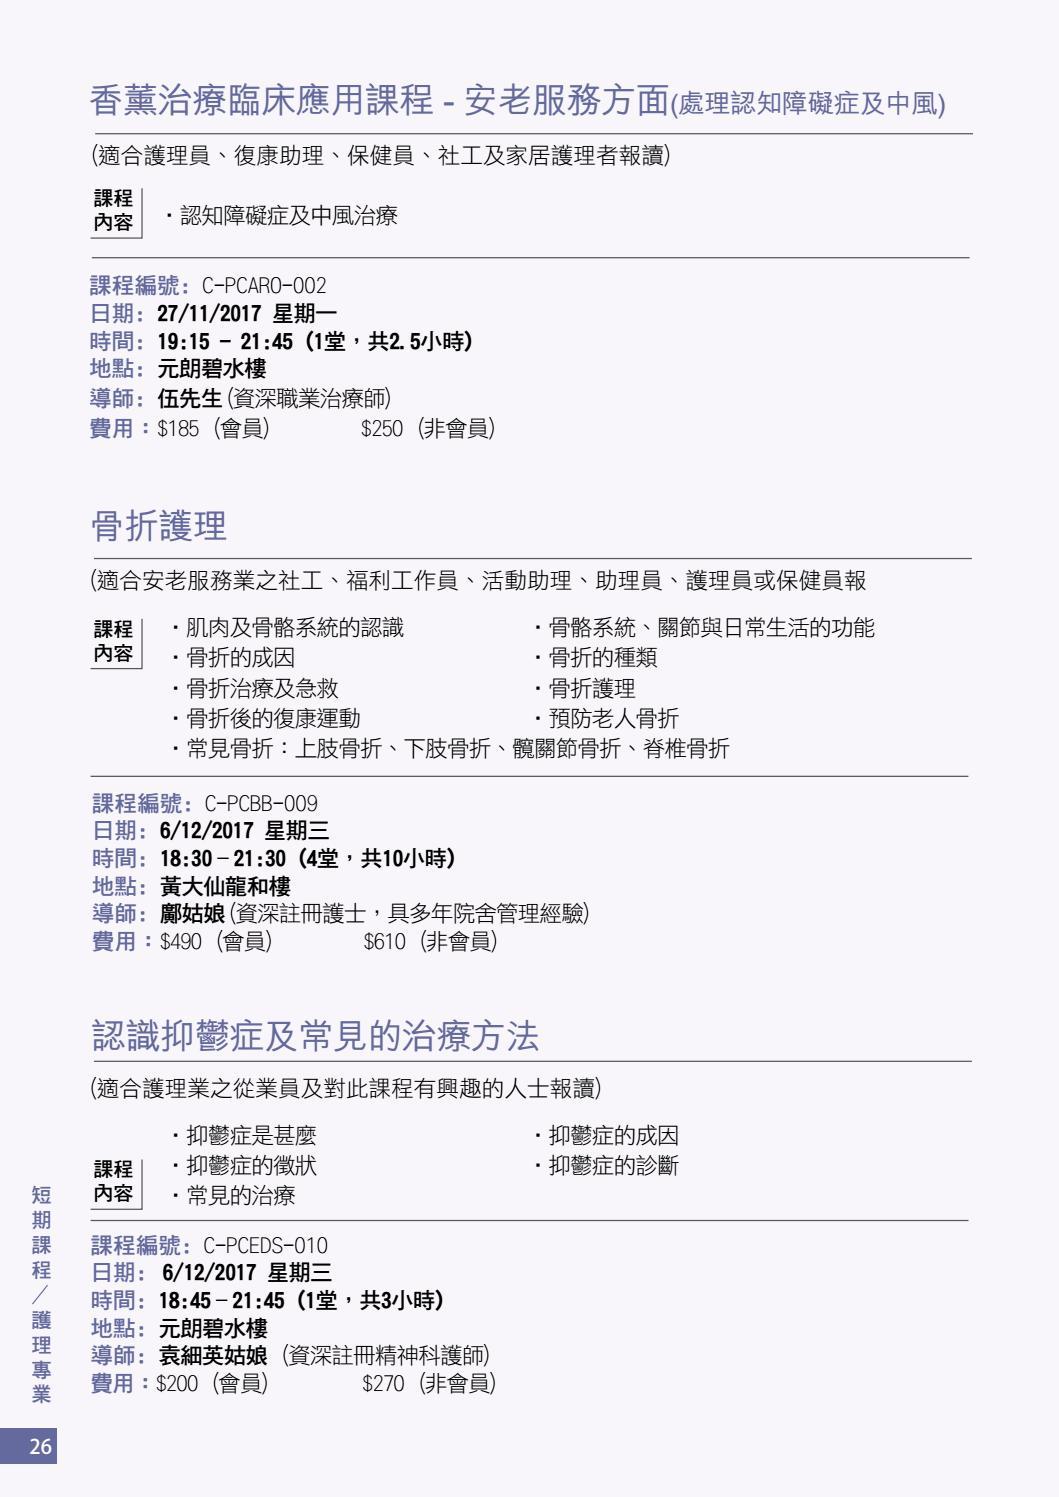 Cdp20180816 by 香港職業發展服務處 - Issuu